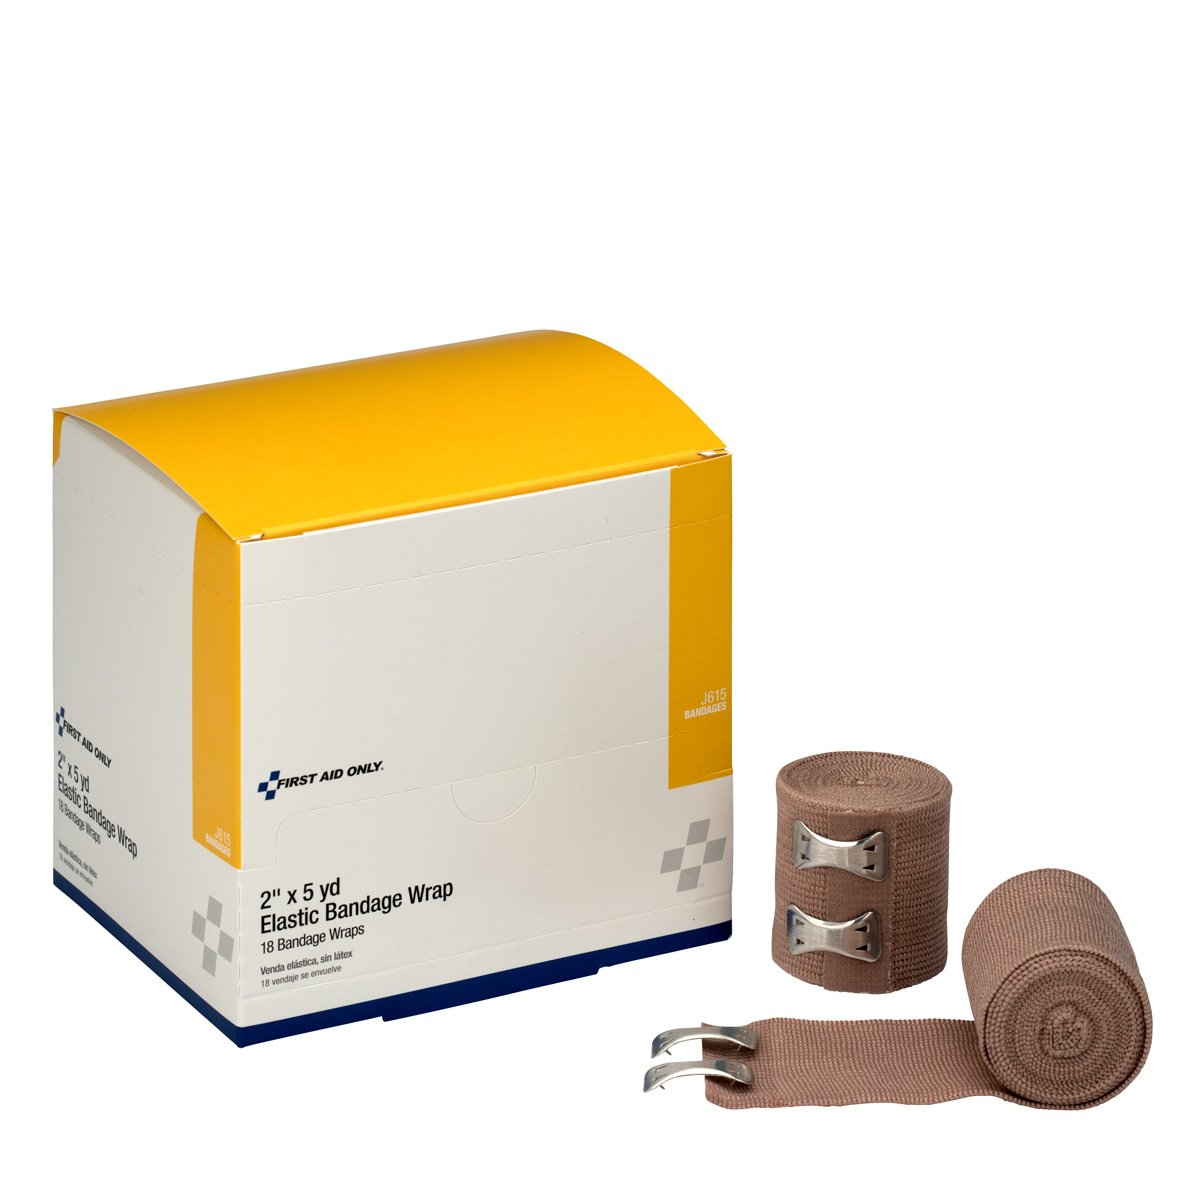 2 In. x 5 Meter. First Aid Nur Elastic - Ace - Bandage - Latex Free mit zwei Verbindungselemente - 18 Per Dispenser Box